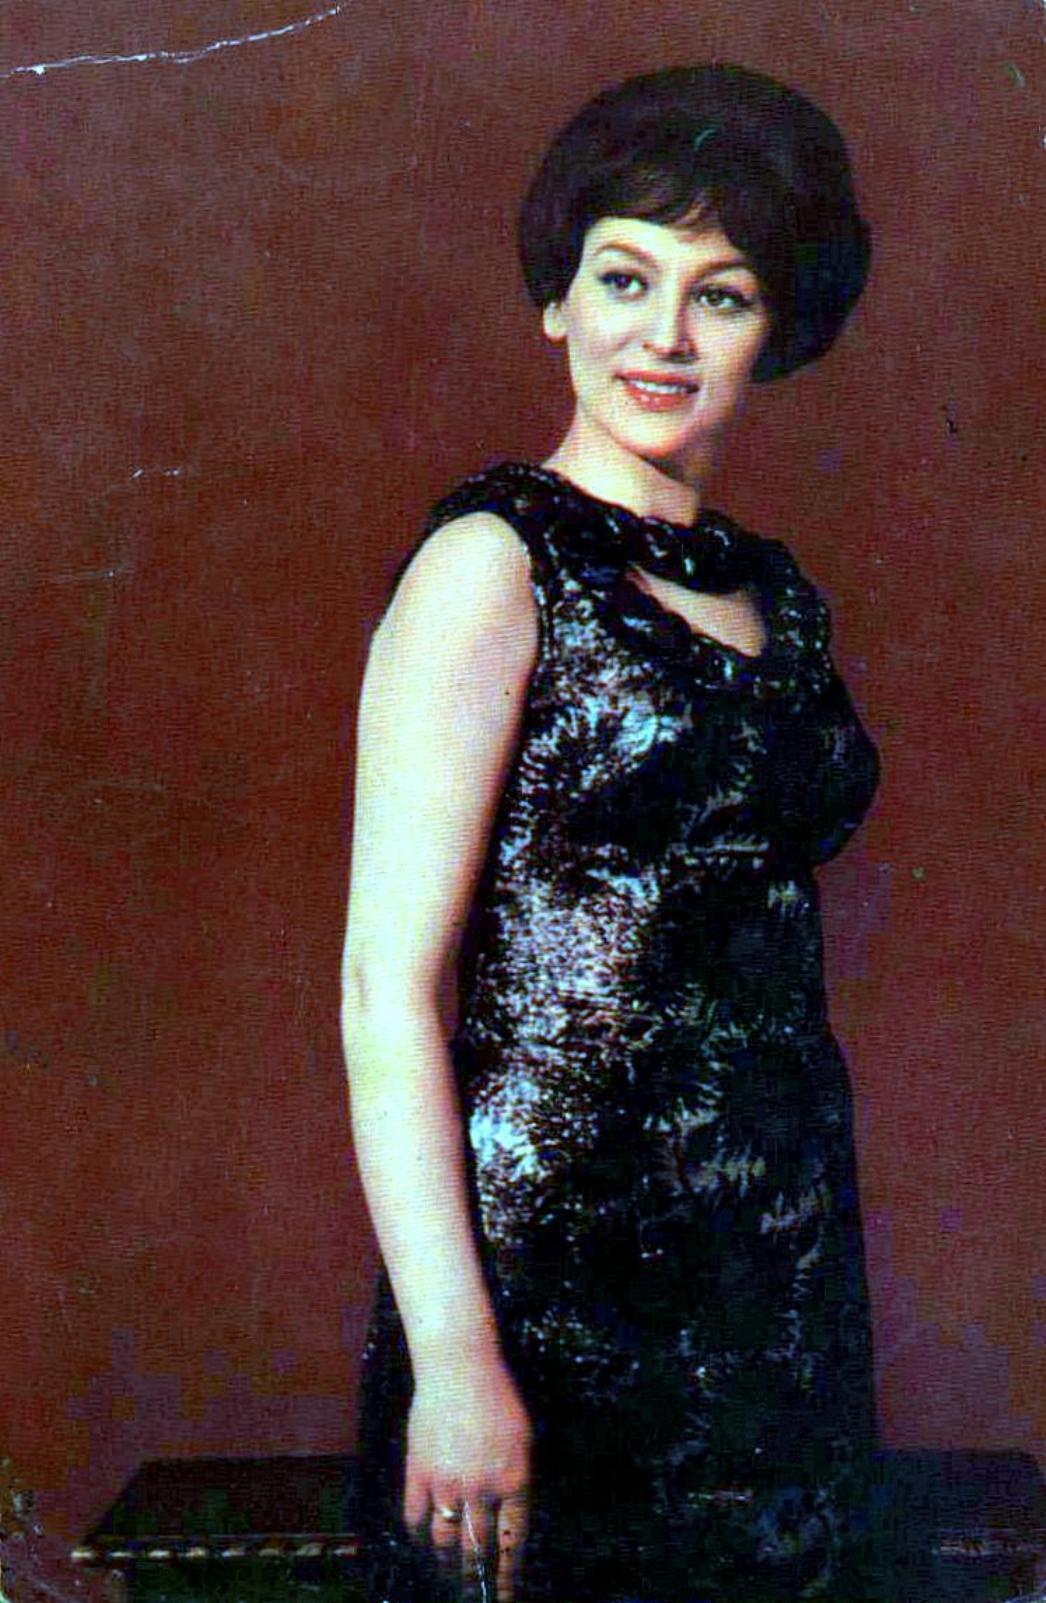 Светлана Коркошко, Актёры Советского кино, коллекция открыток